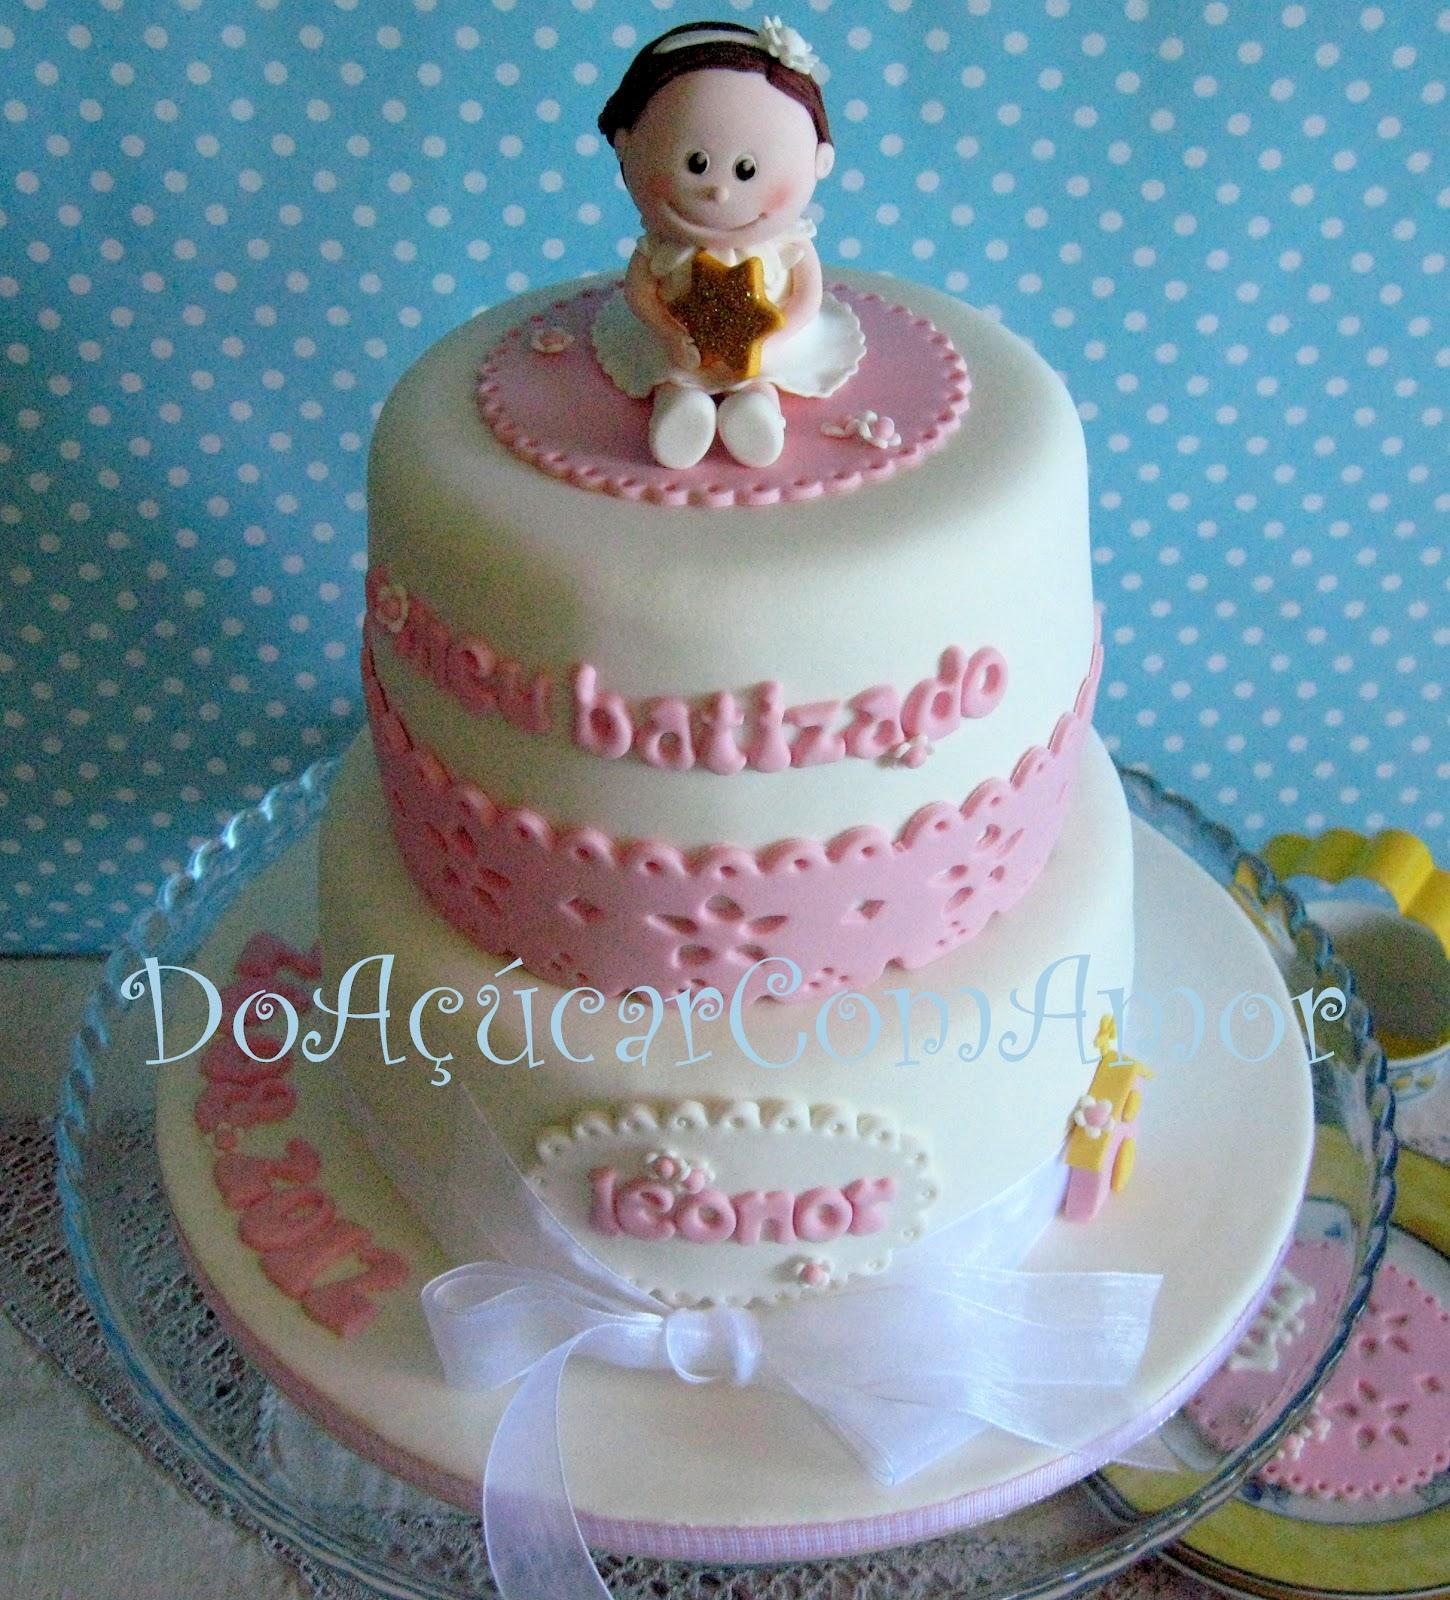 Ingles Cakes for Birthday